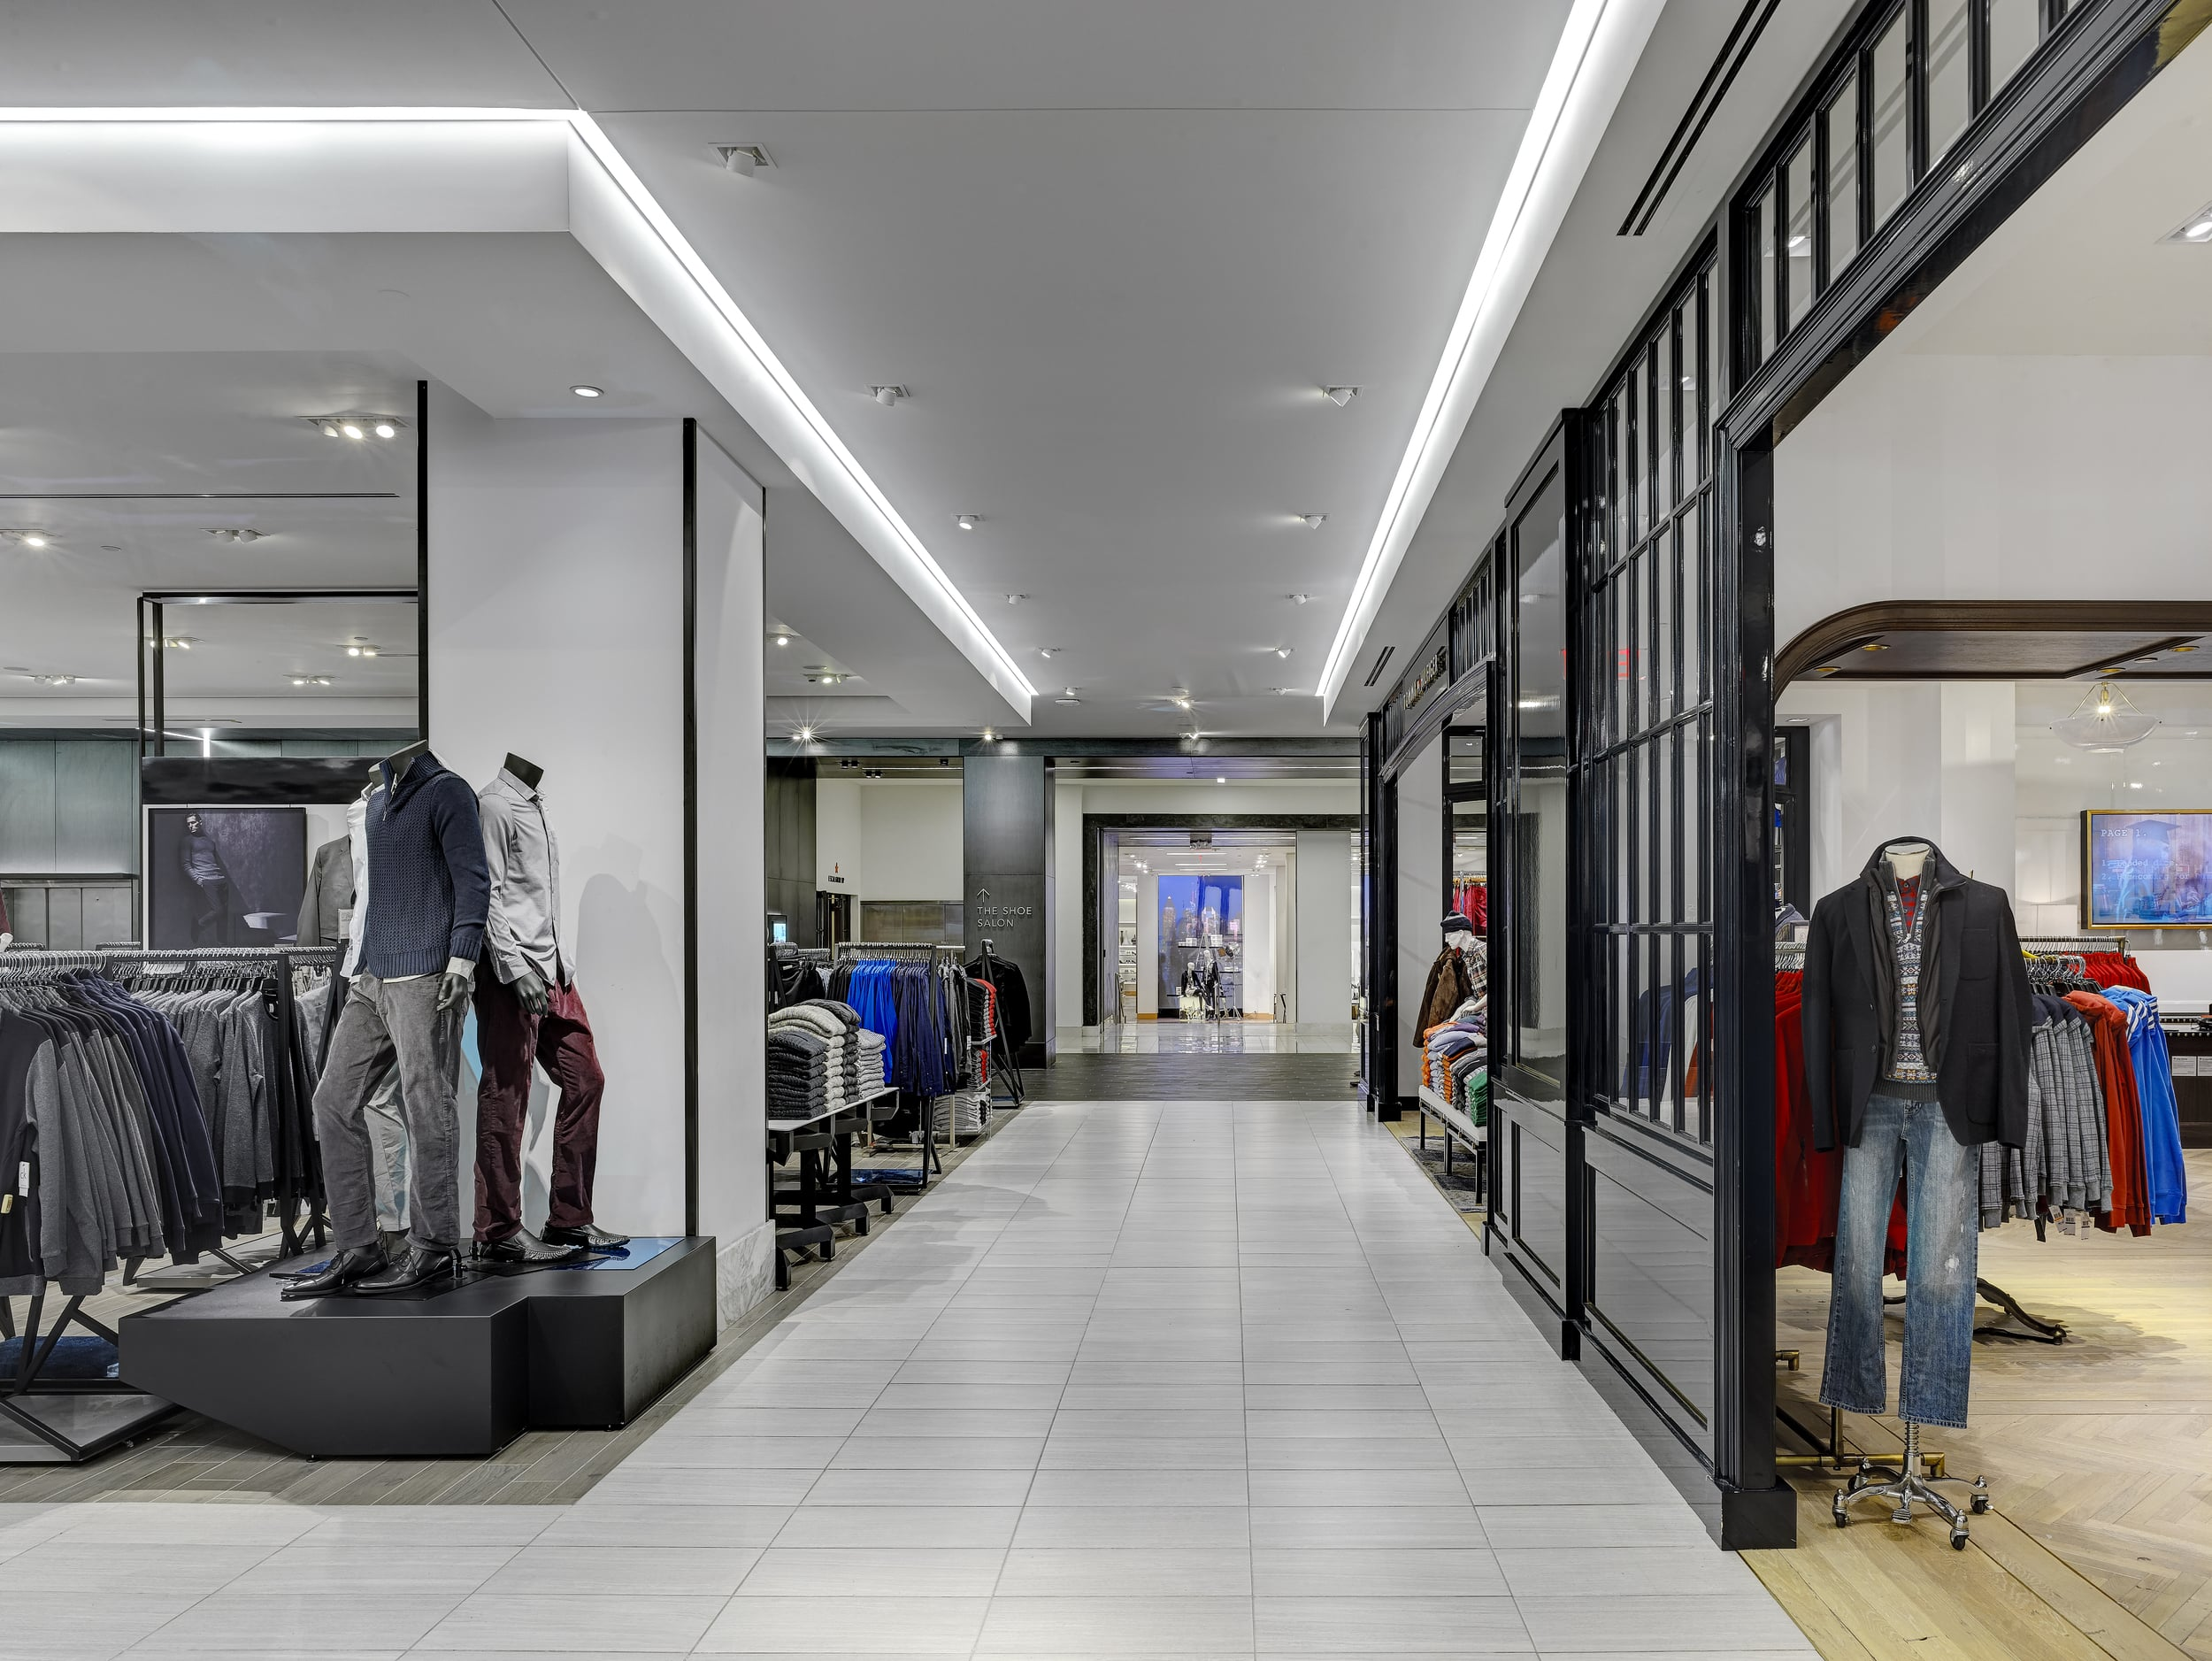 Interior Designer: Charles Sparks & Co.